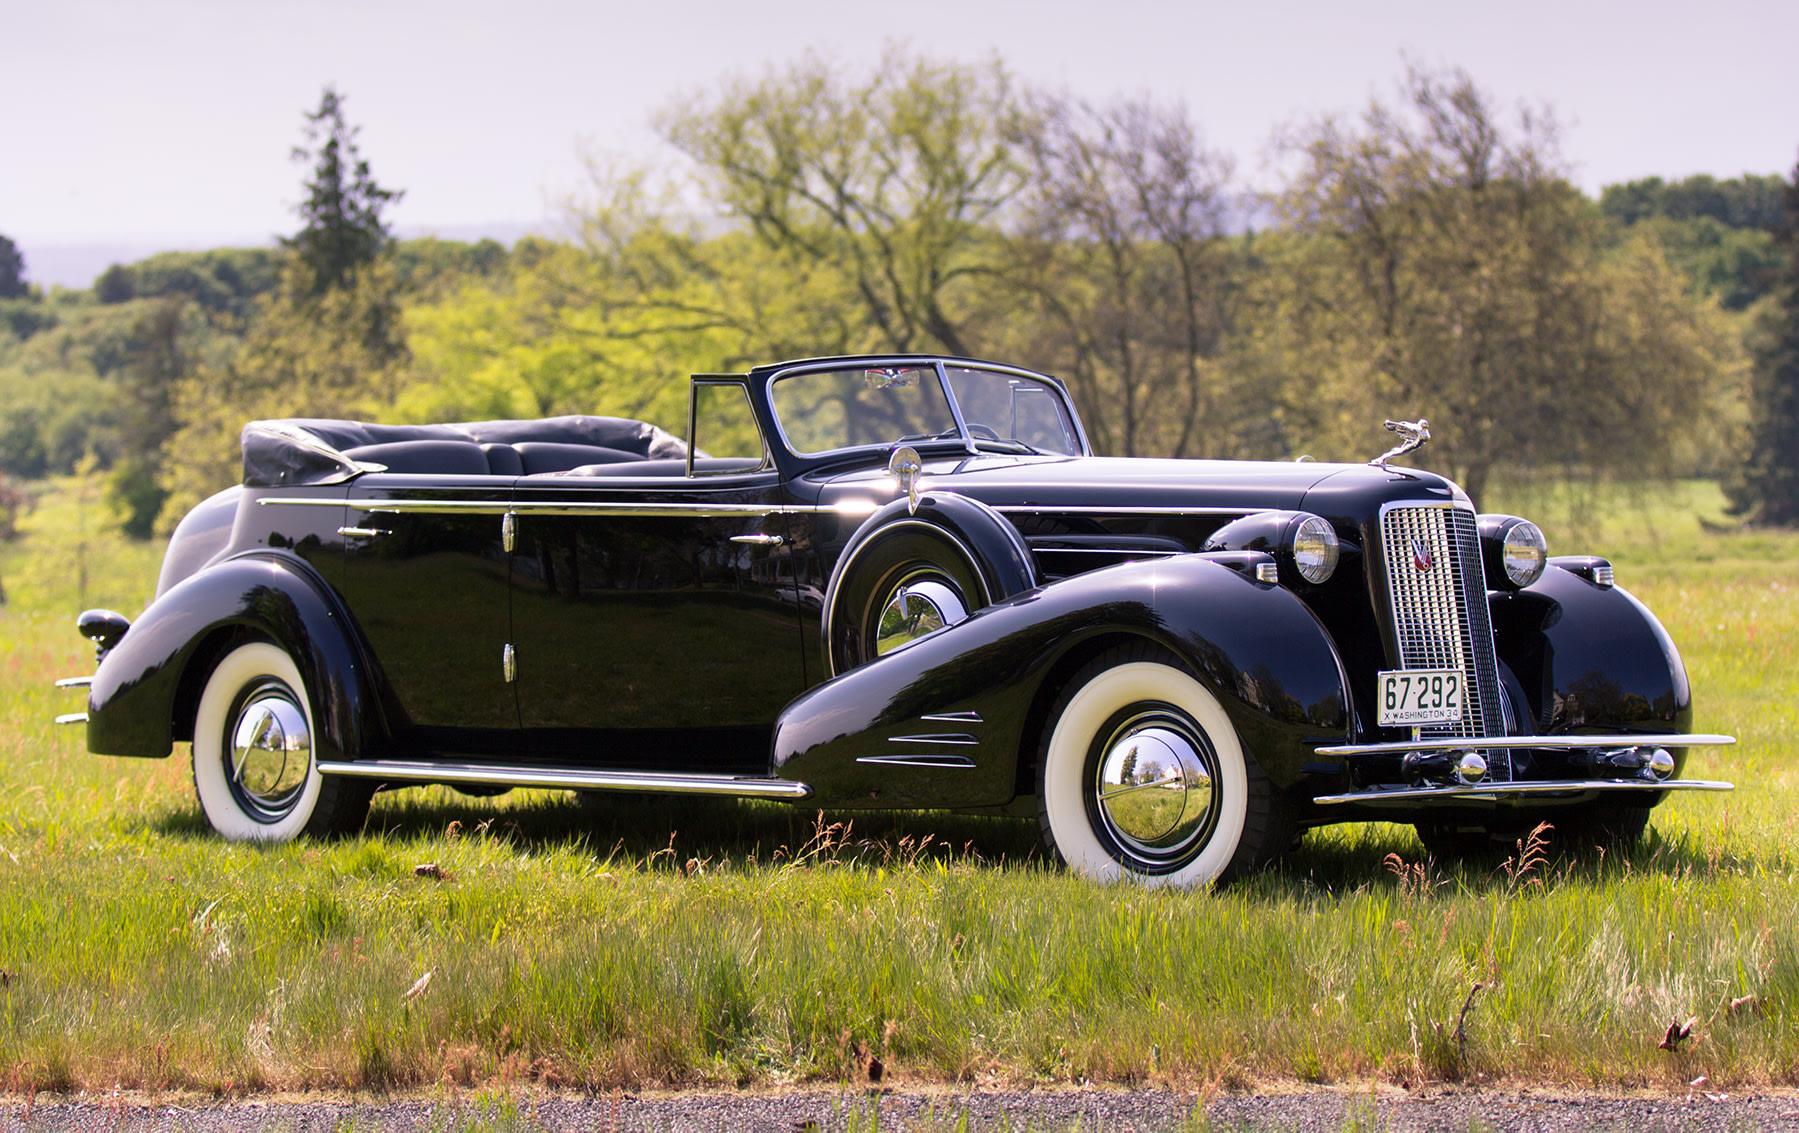 1934 Cadillac V-16 452D Convertible Sedan